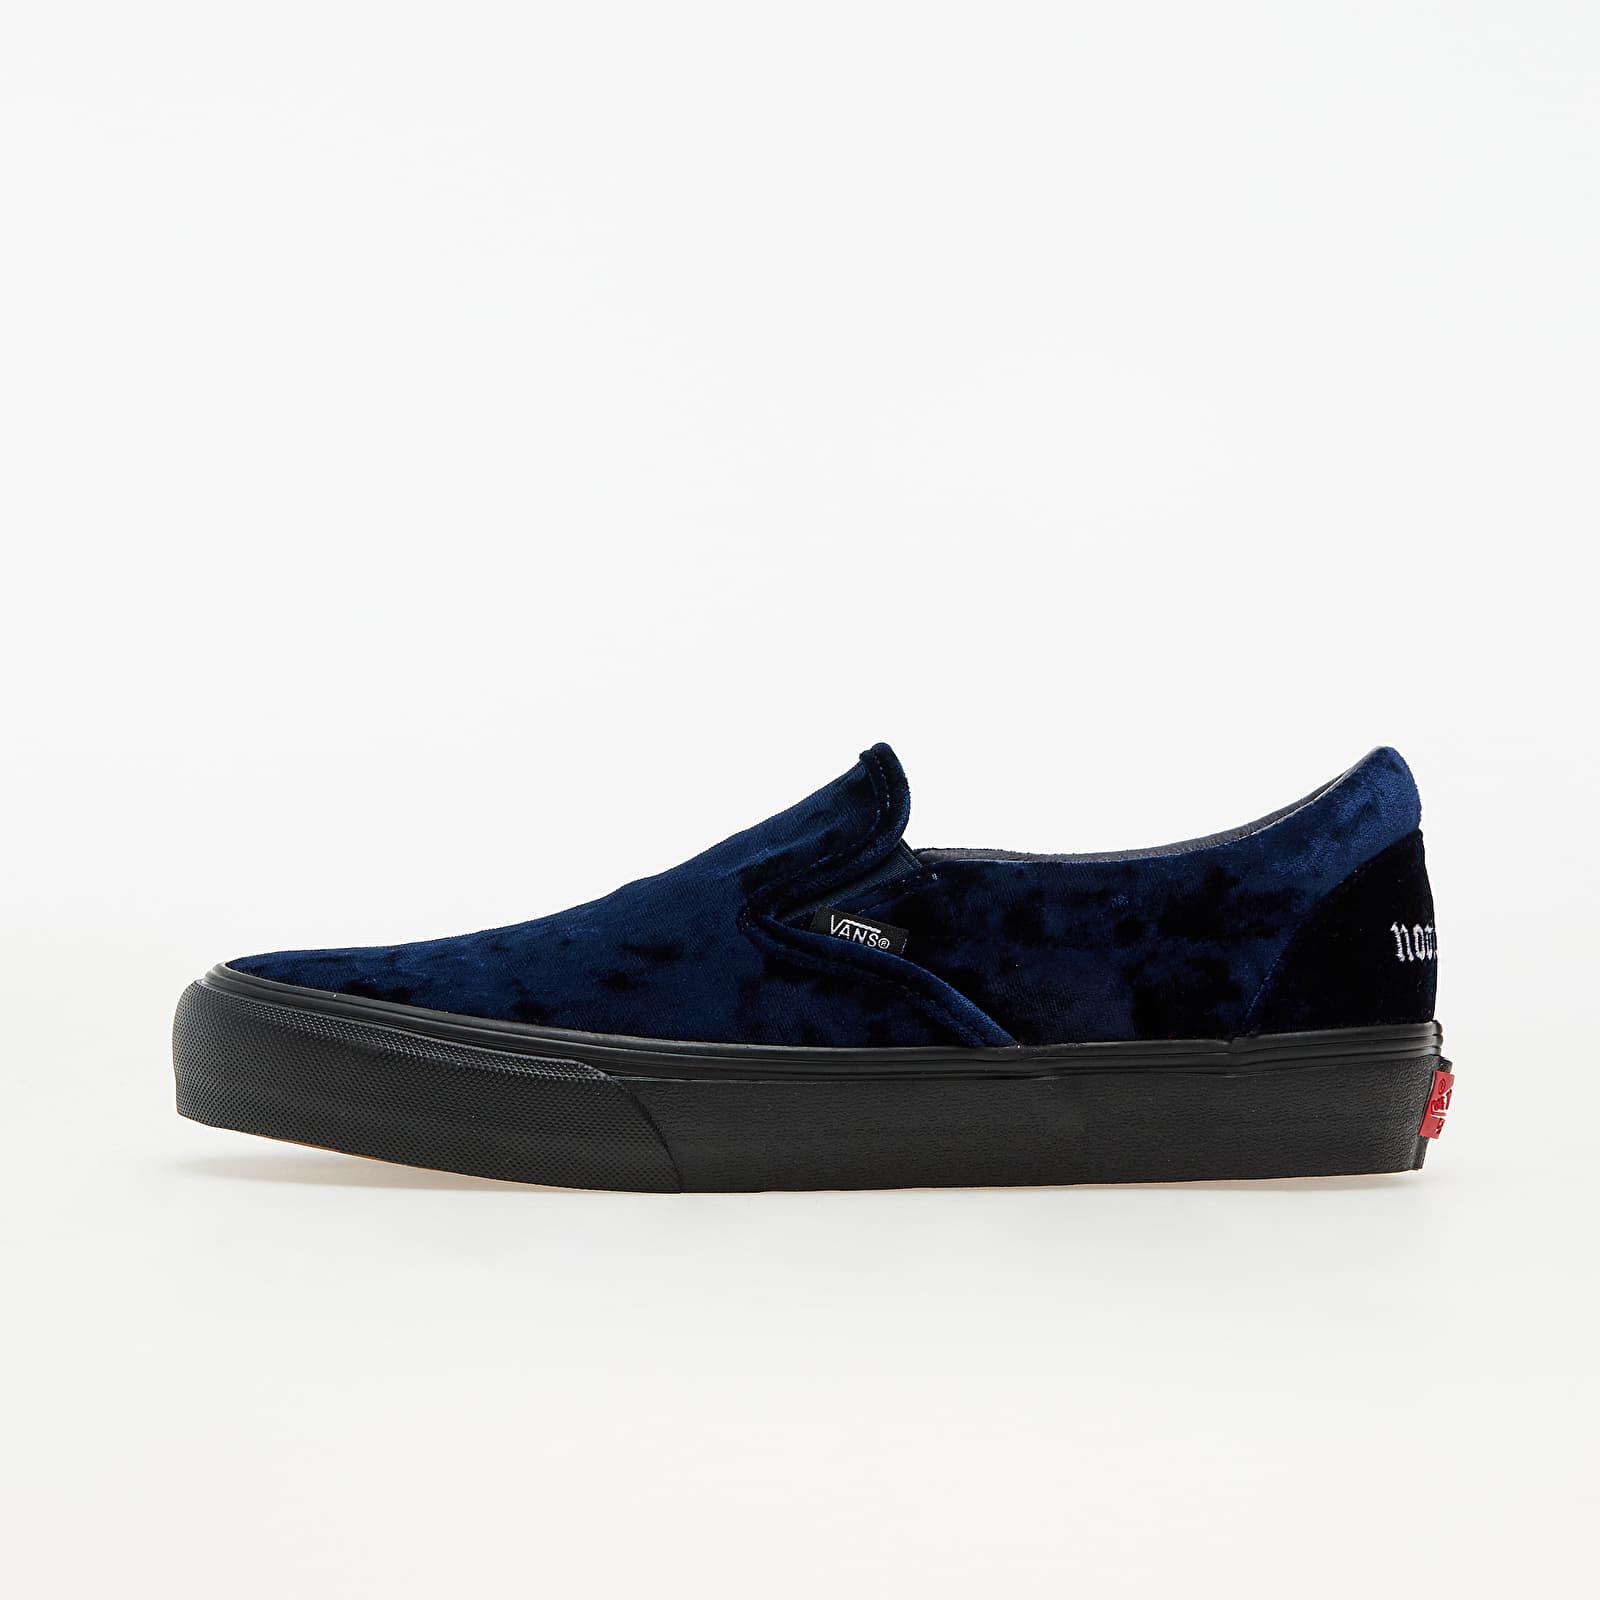 Vans Vault Classic Slip-On LX (Noon Goons) Black/ Velvet VN0A3QXY5VF1